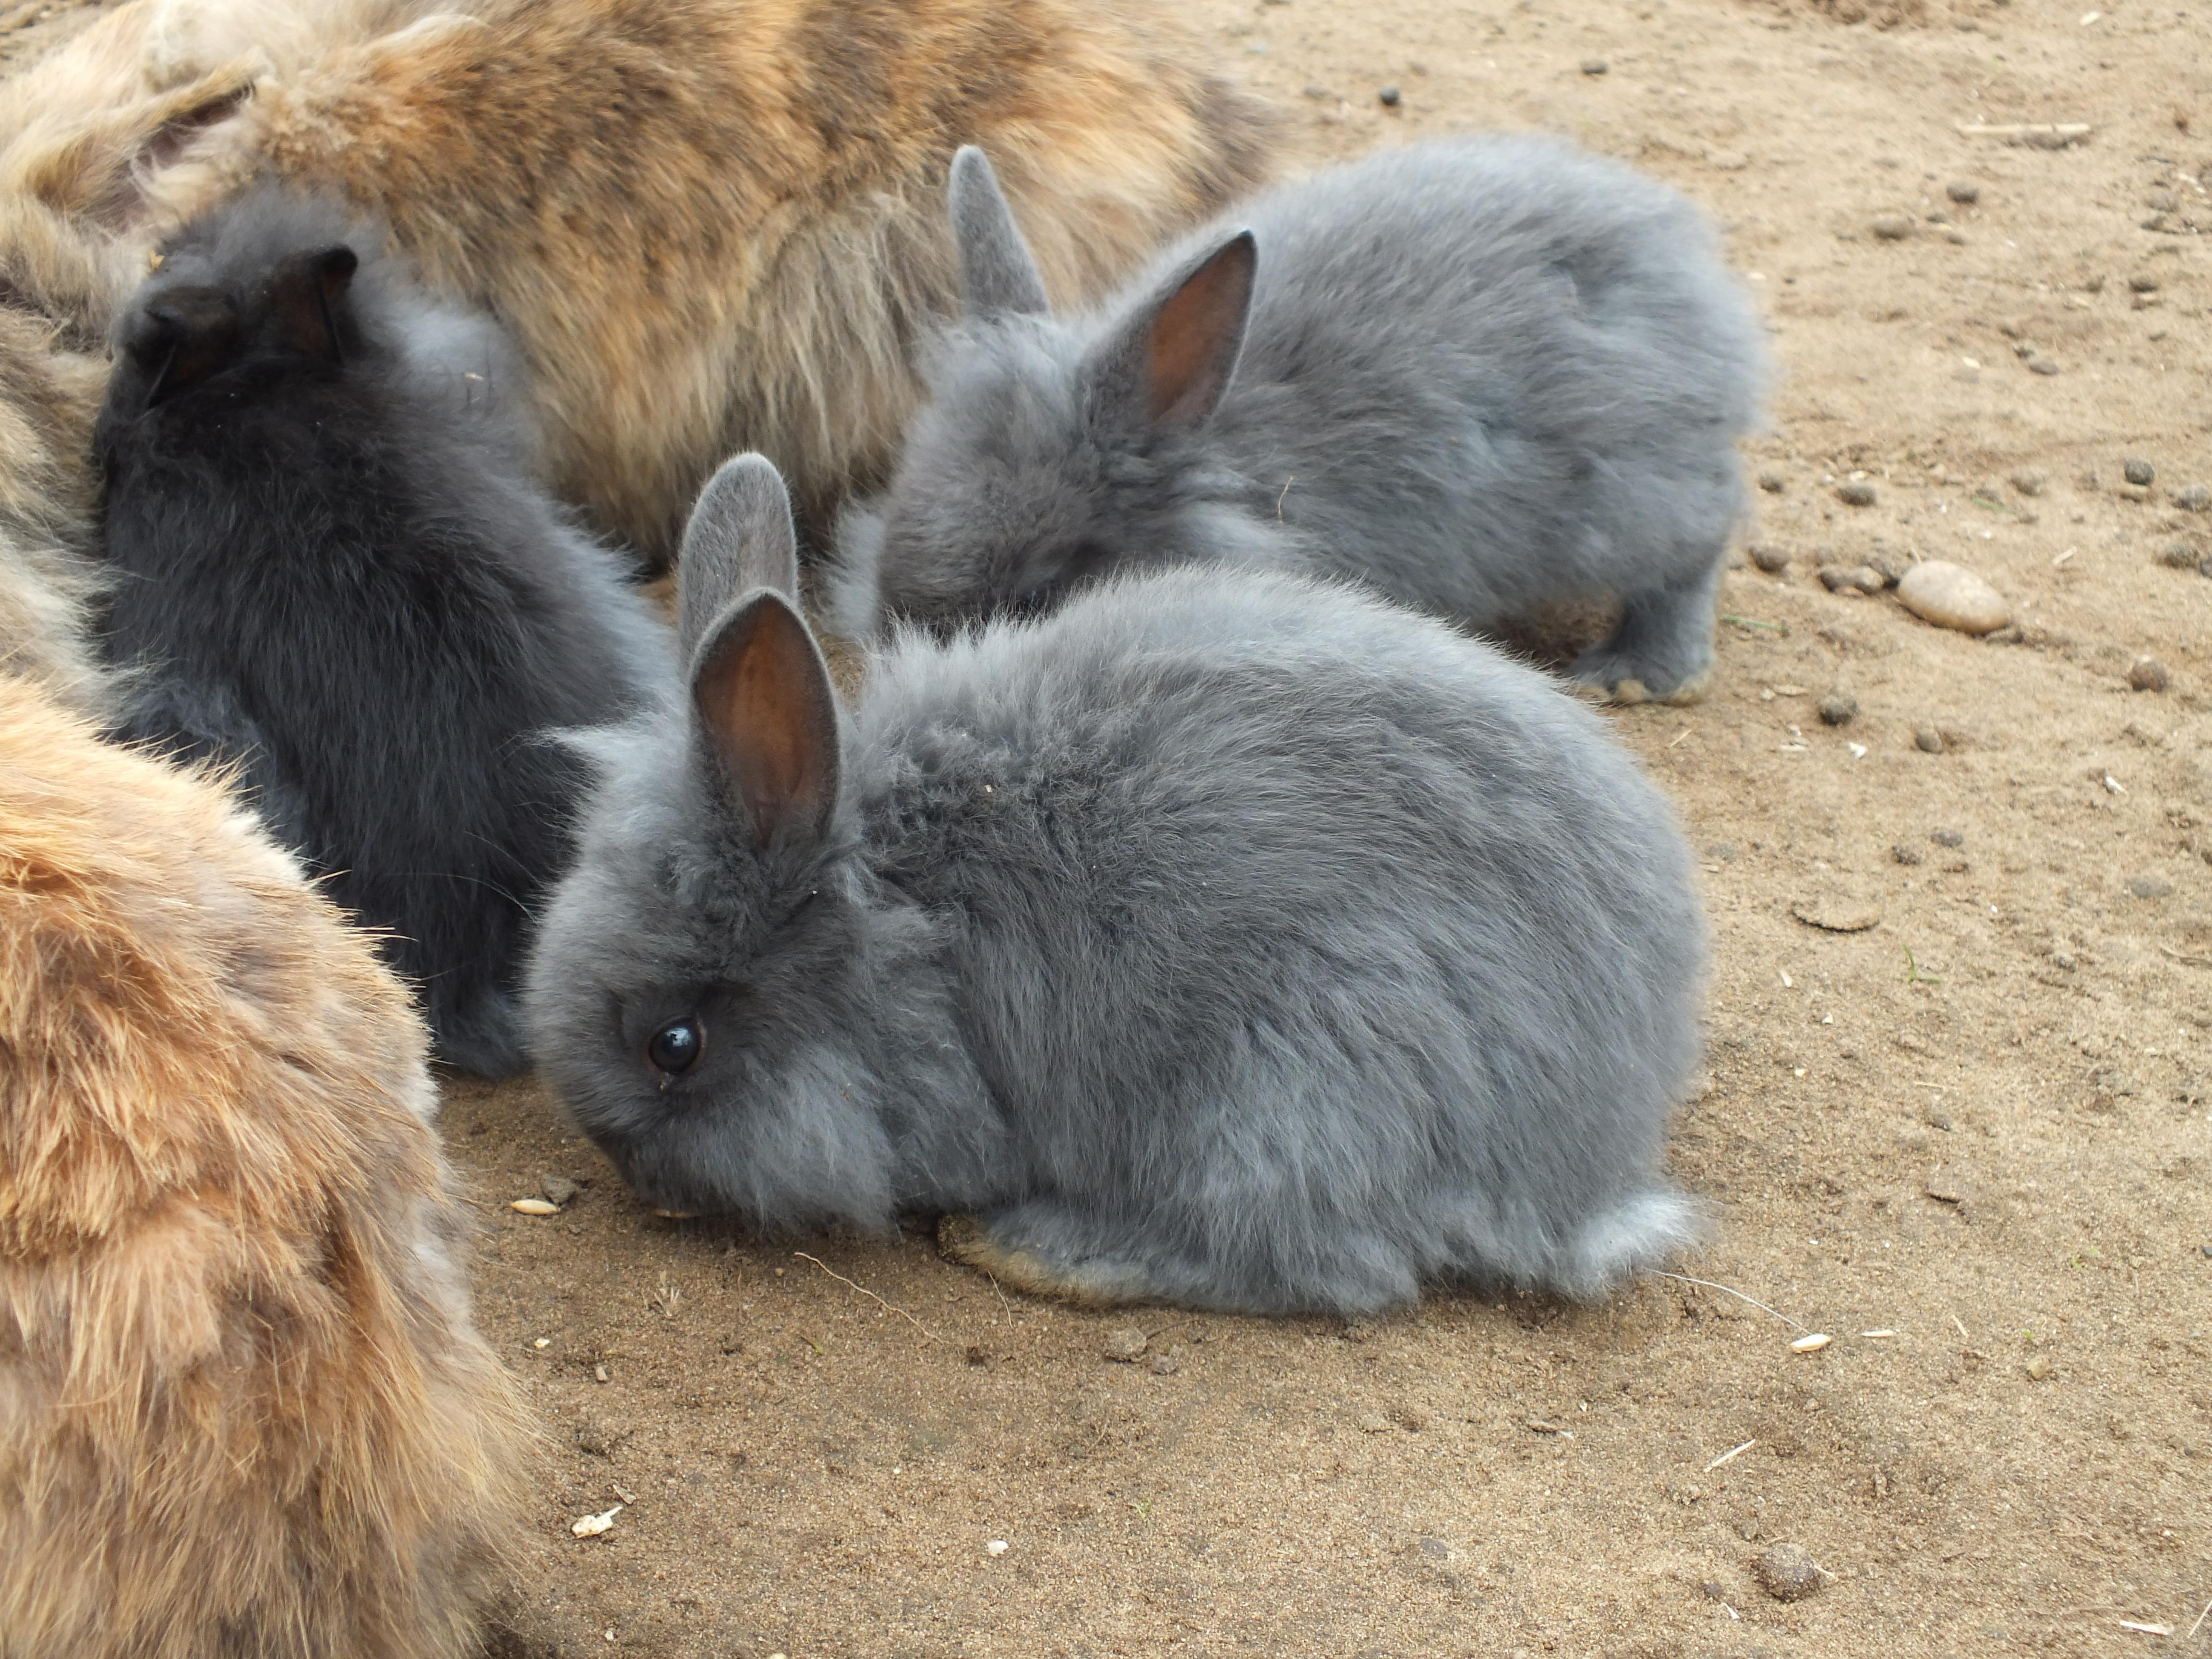 Rabbits, Animals, Bunnies, Bunny, Fluffy, HQ Photo